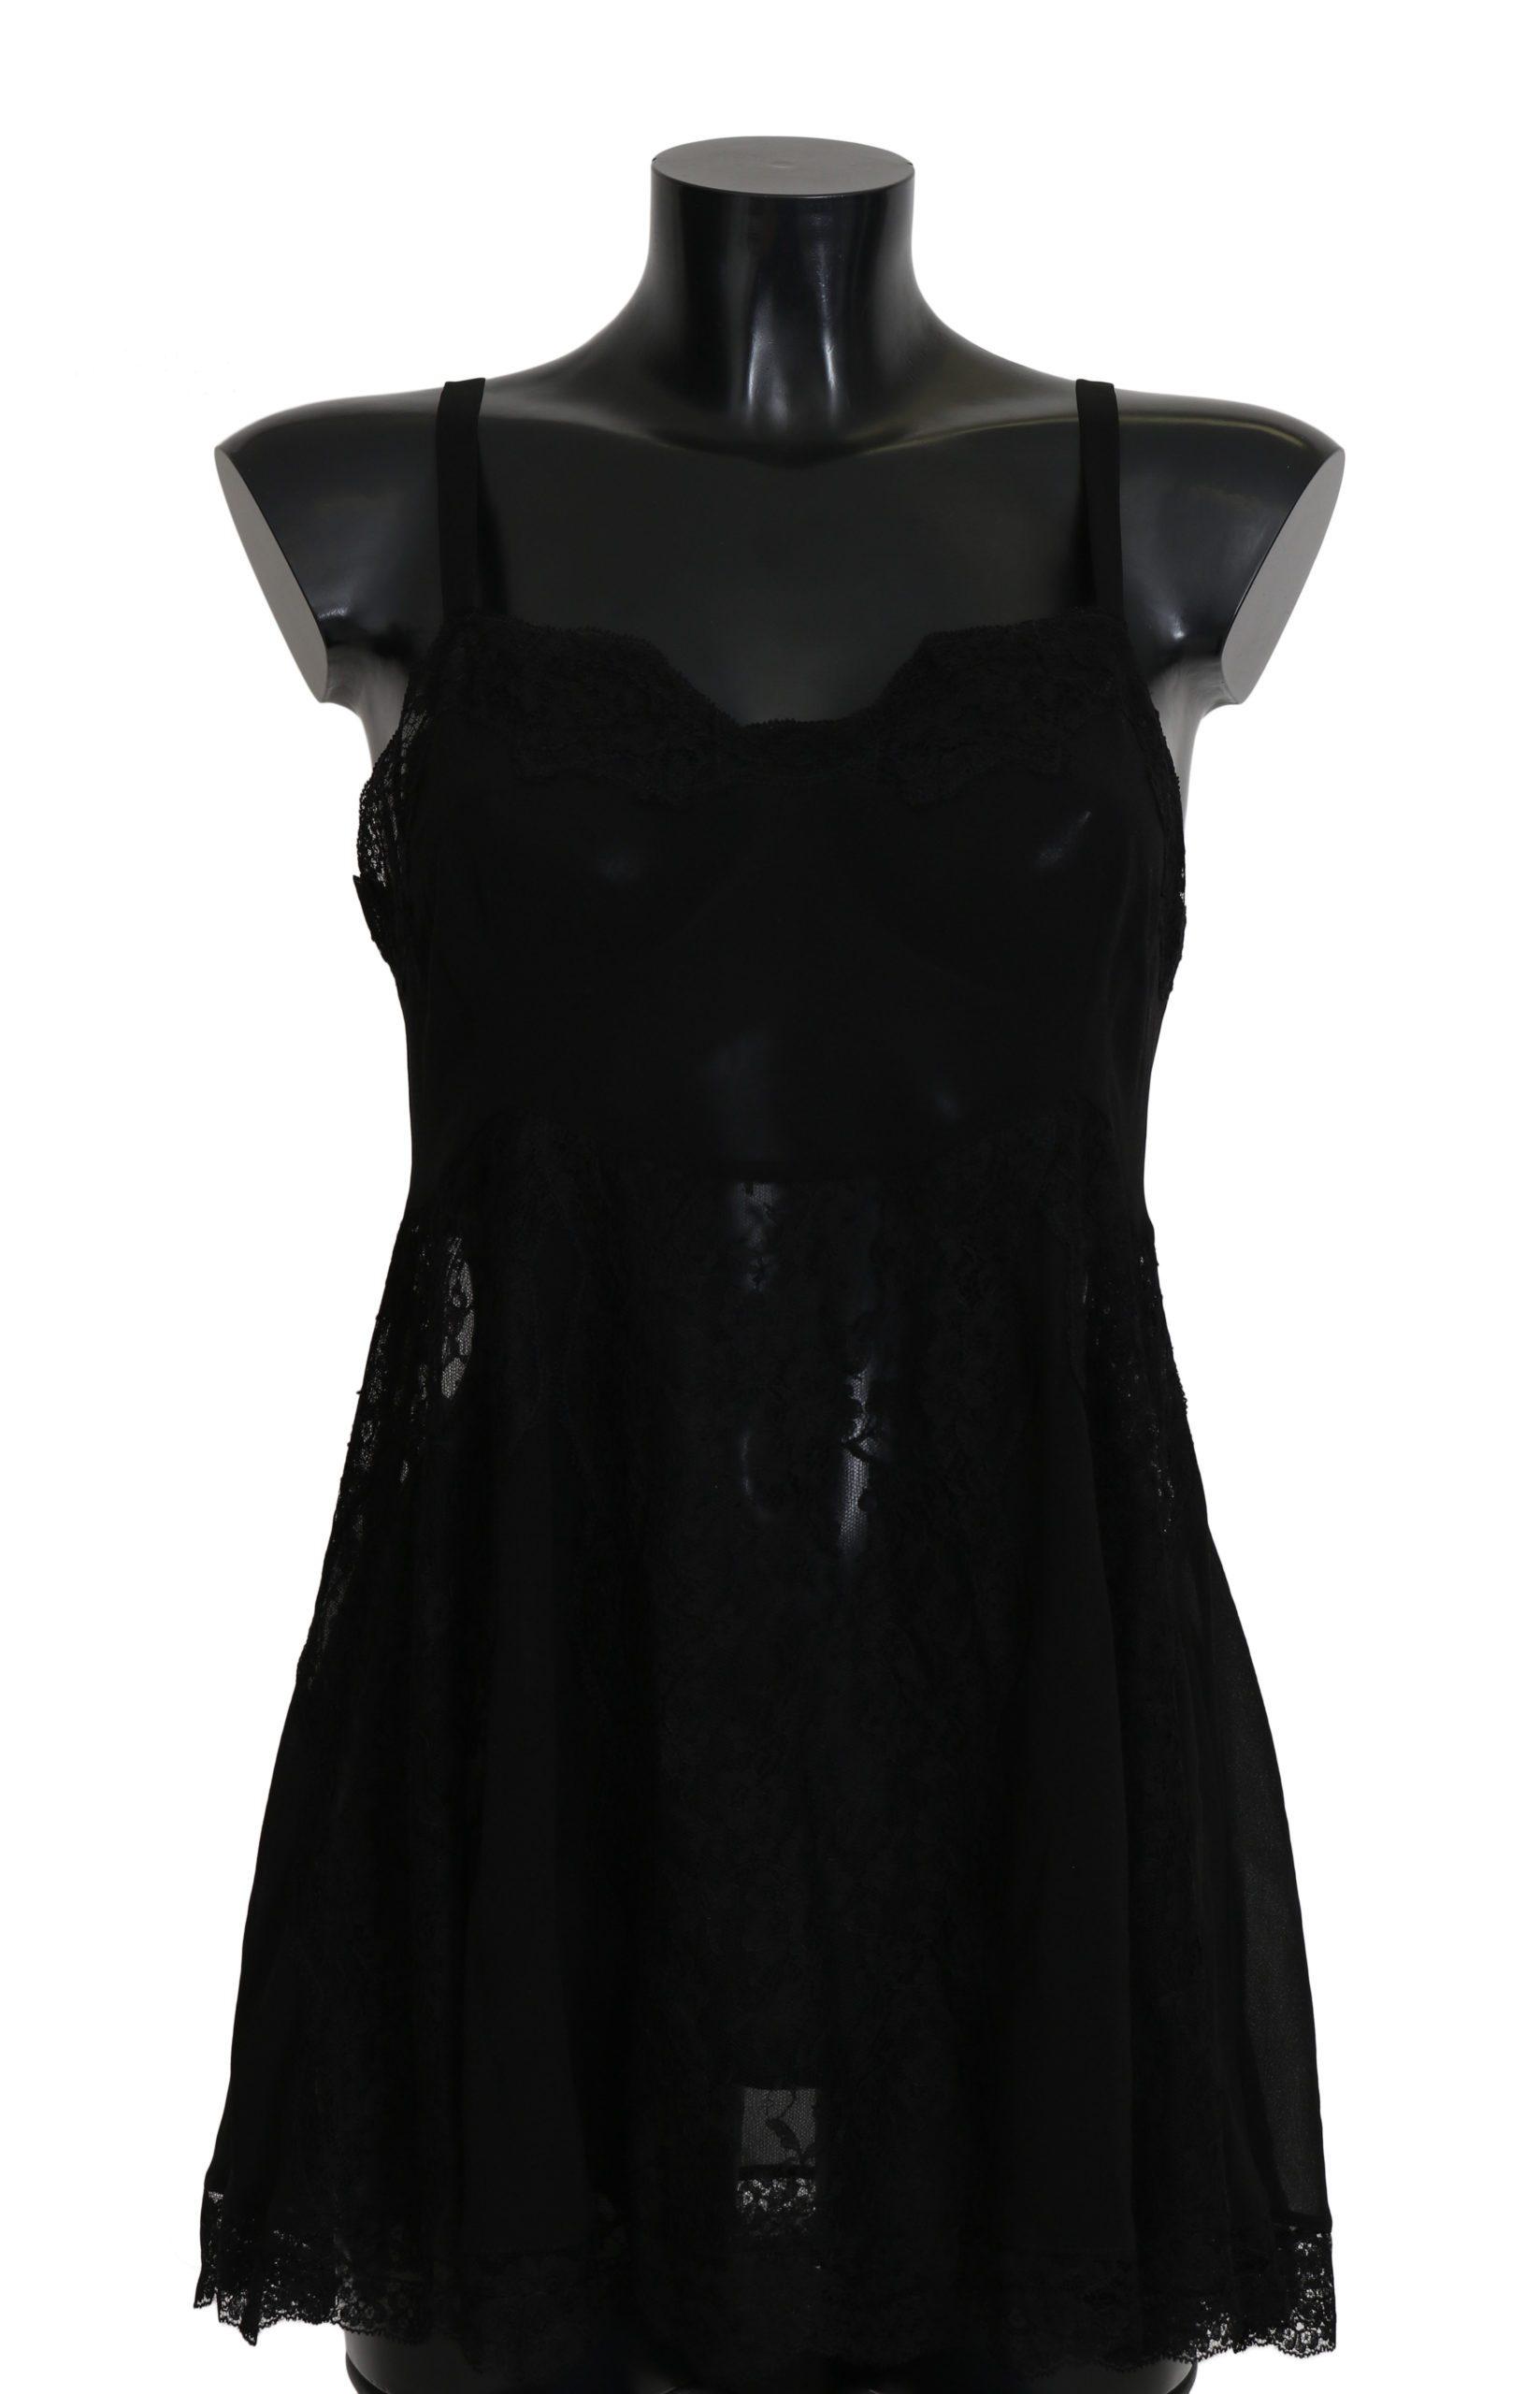 Dolce & Gabbana Women's Dress Black BIK263 - IT3   M